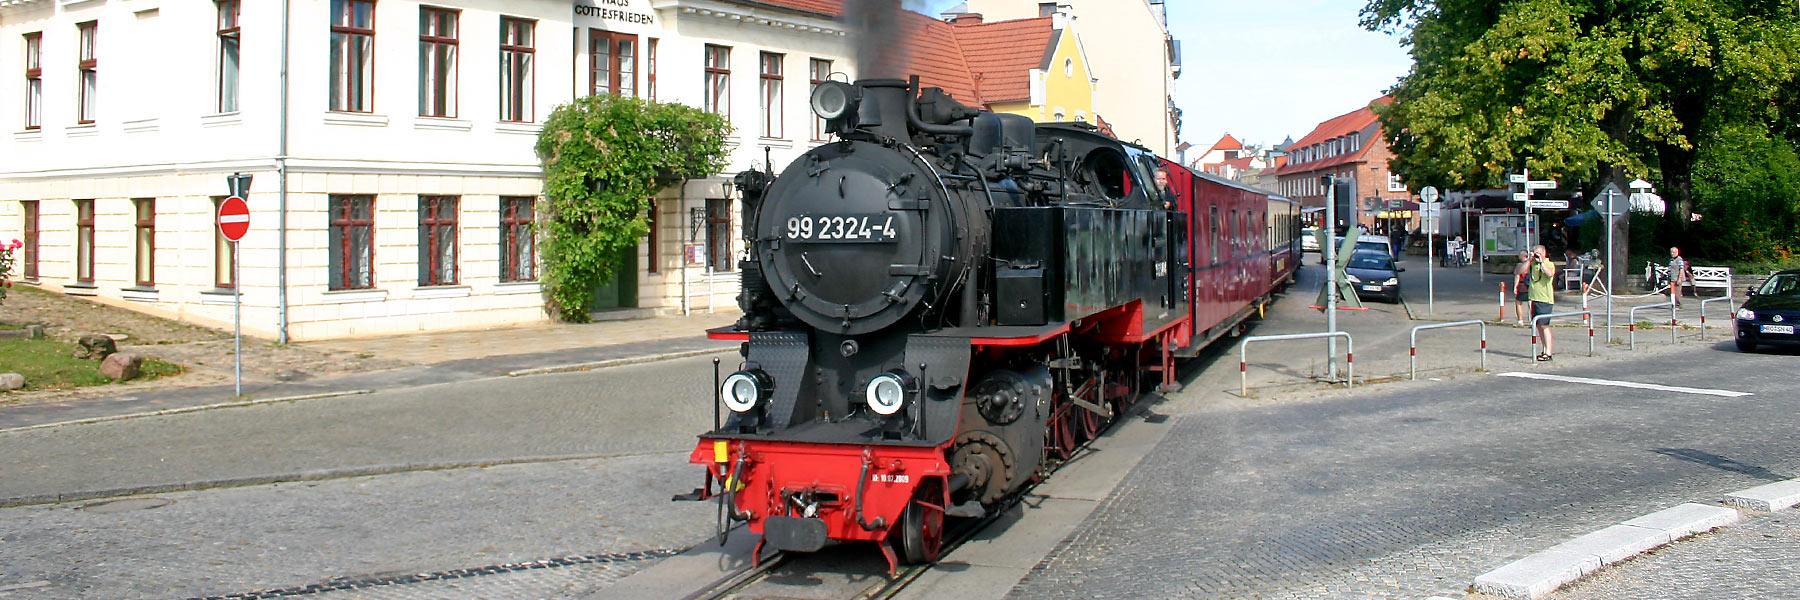 Bäderbahn Molli - Bad Doberan